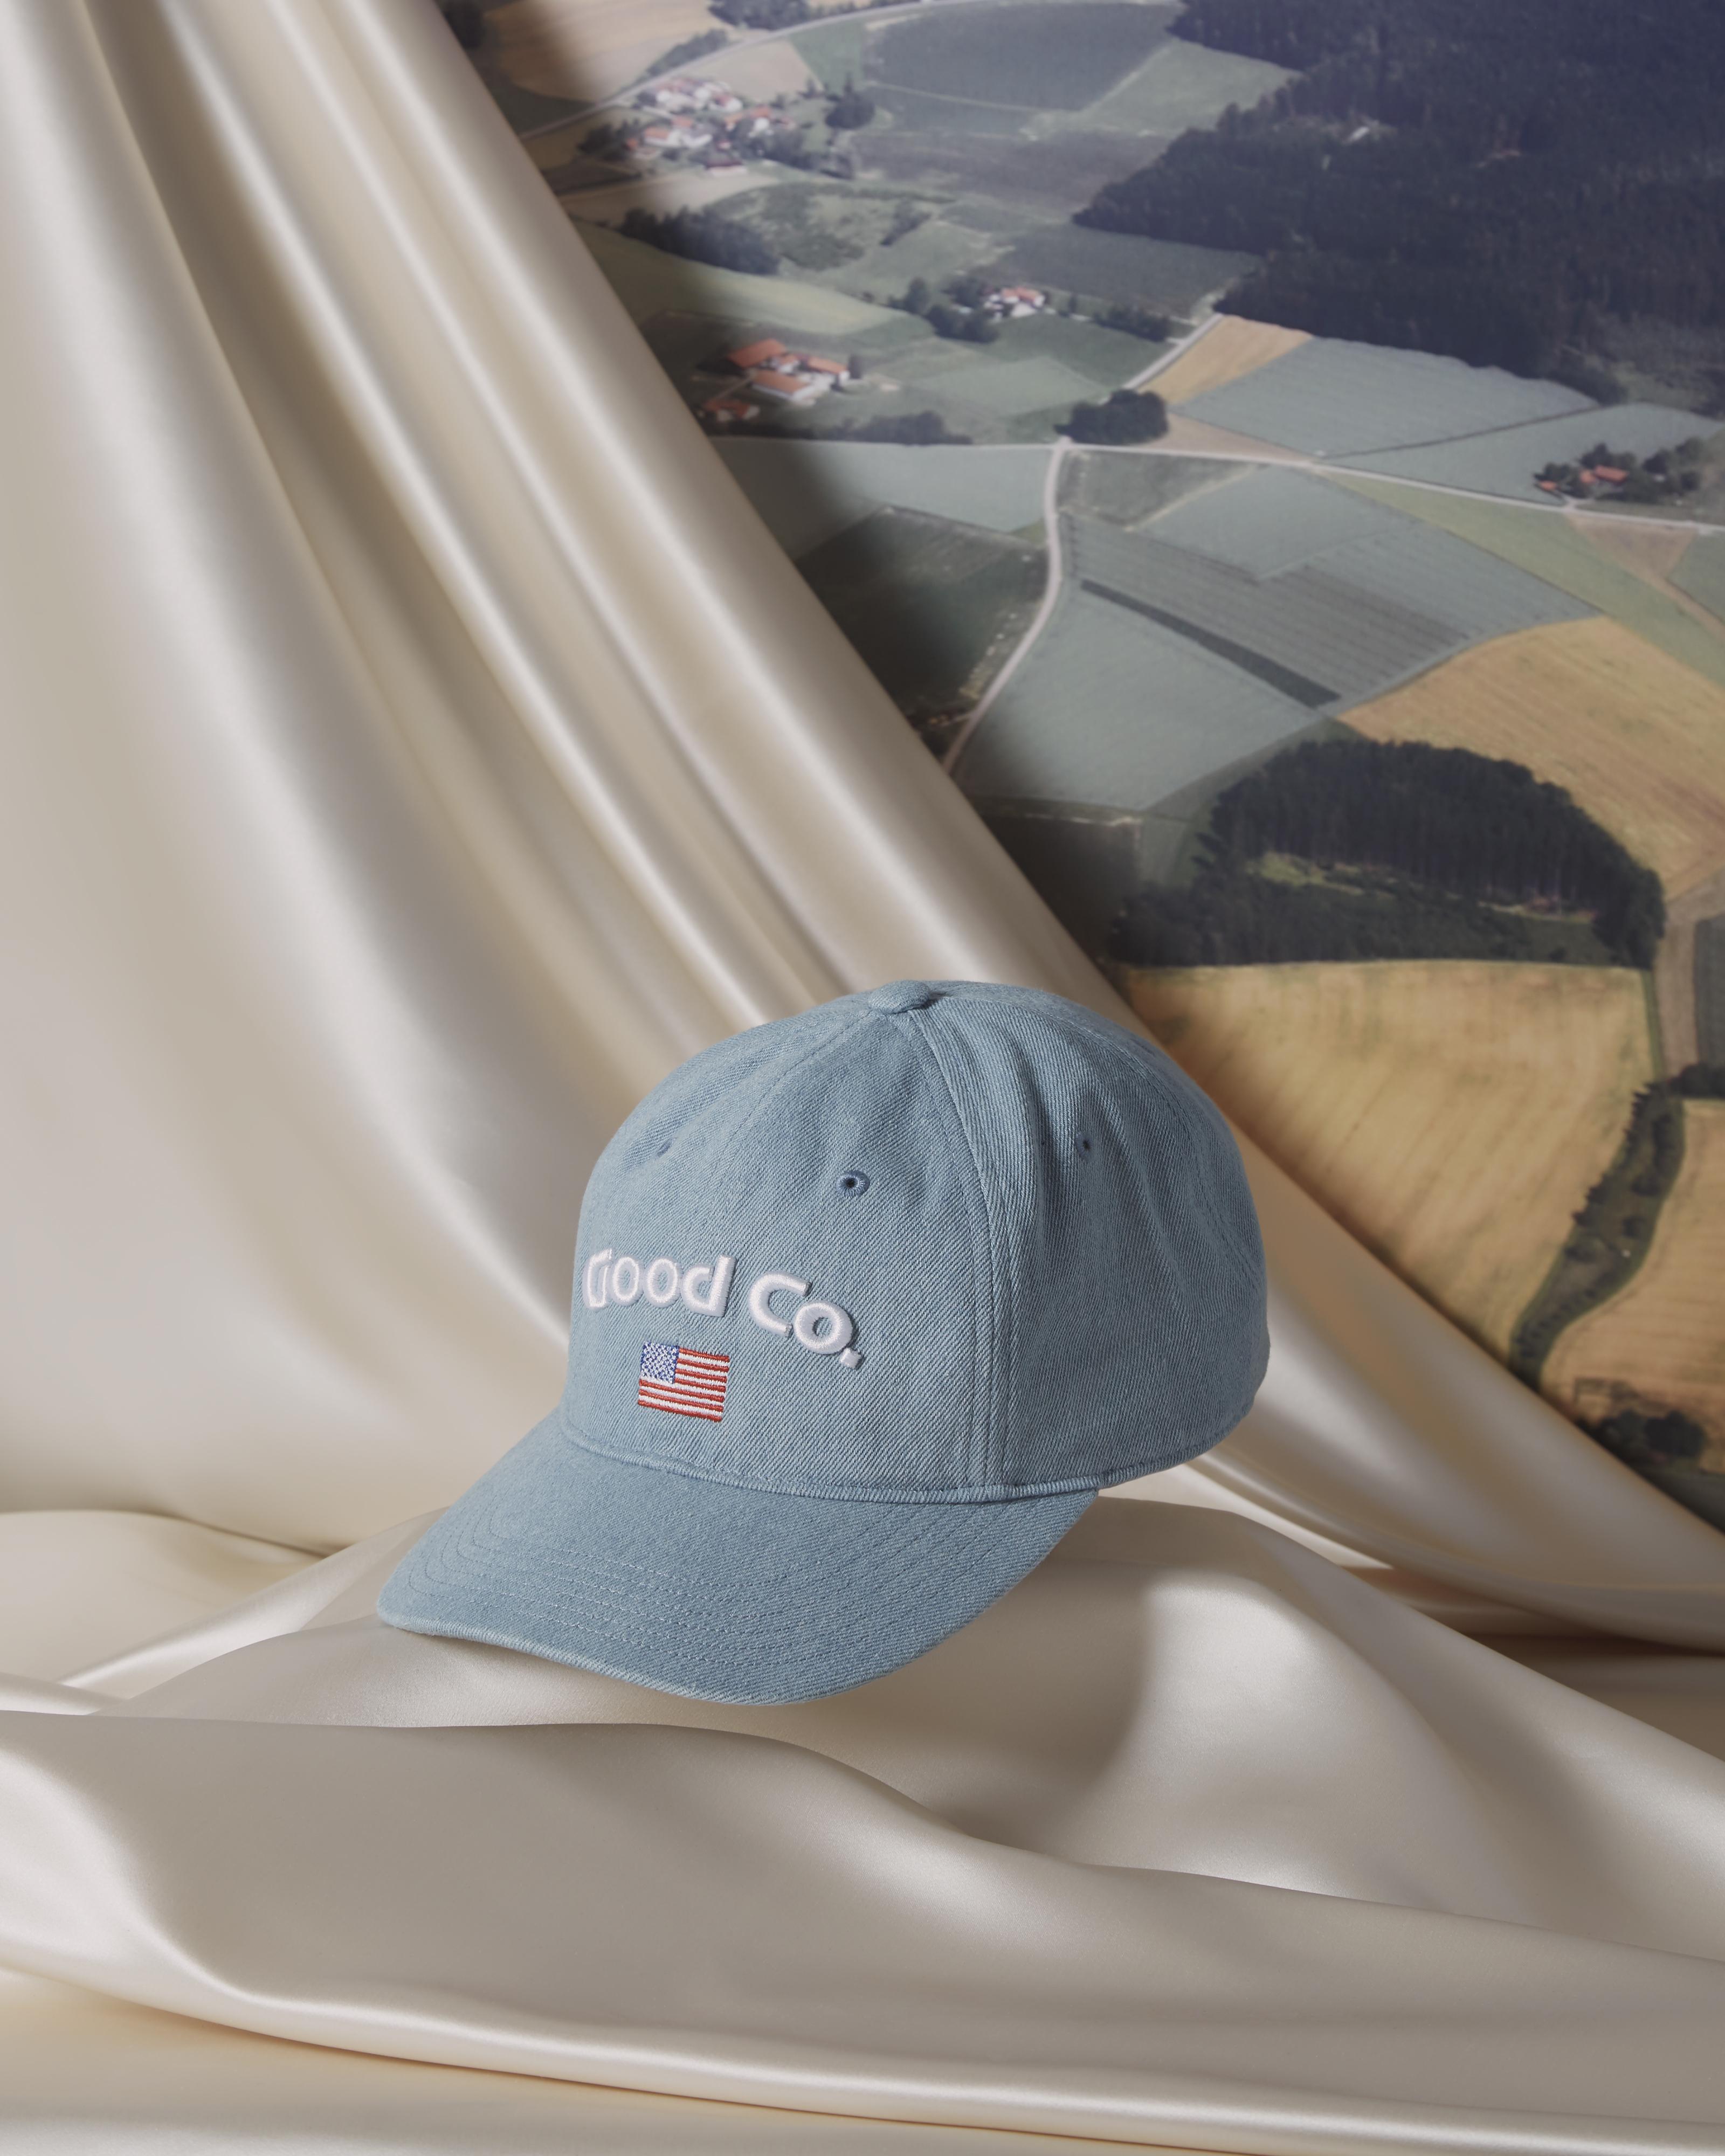 The Good Company X Reebok